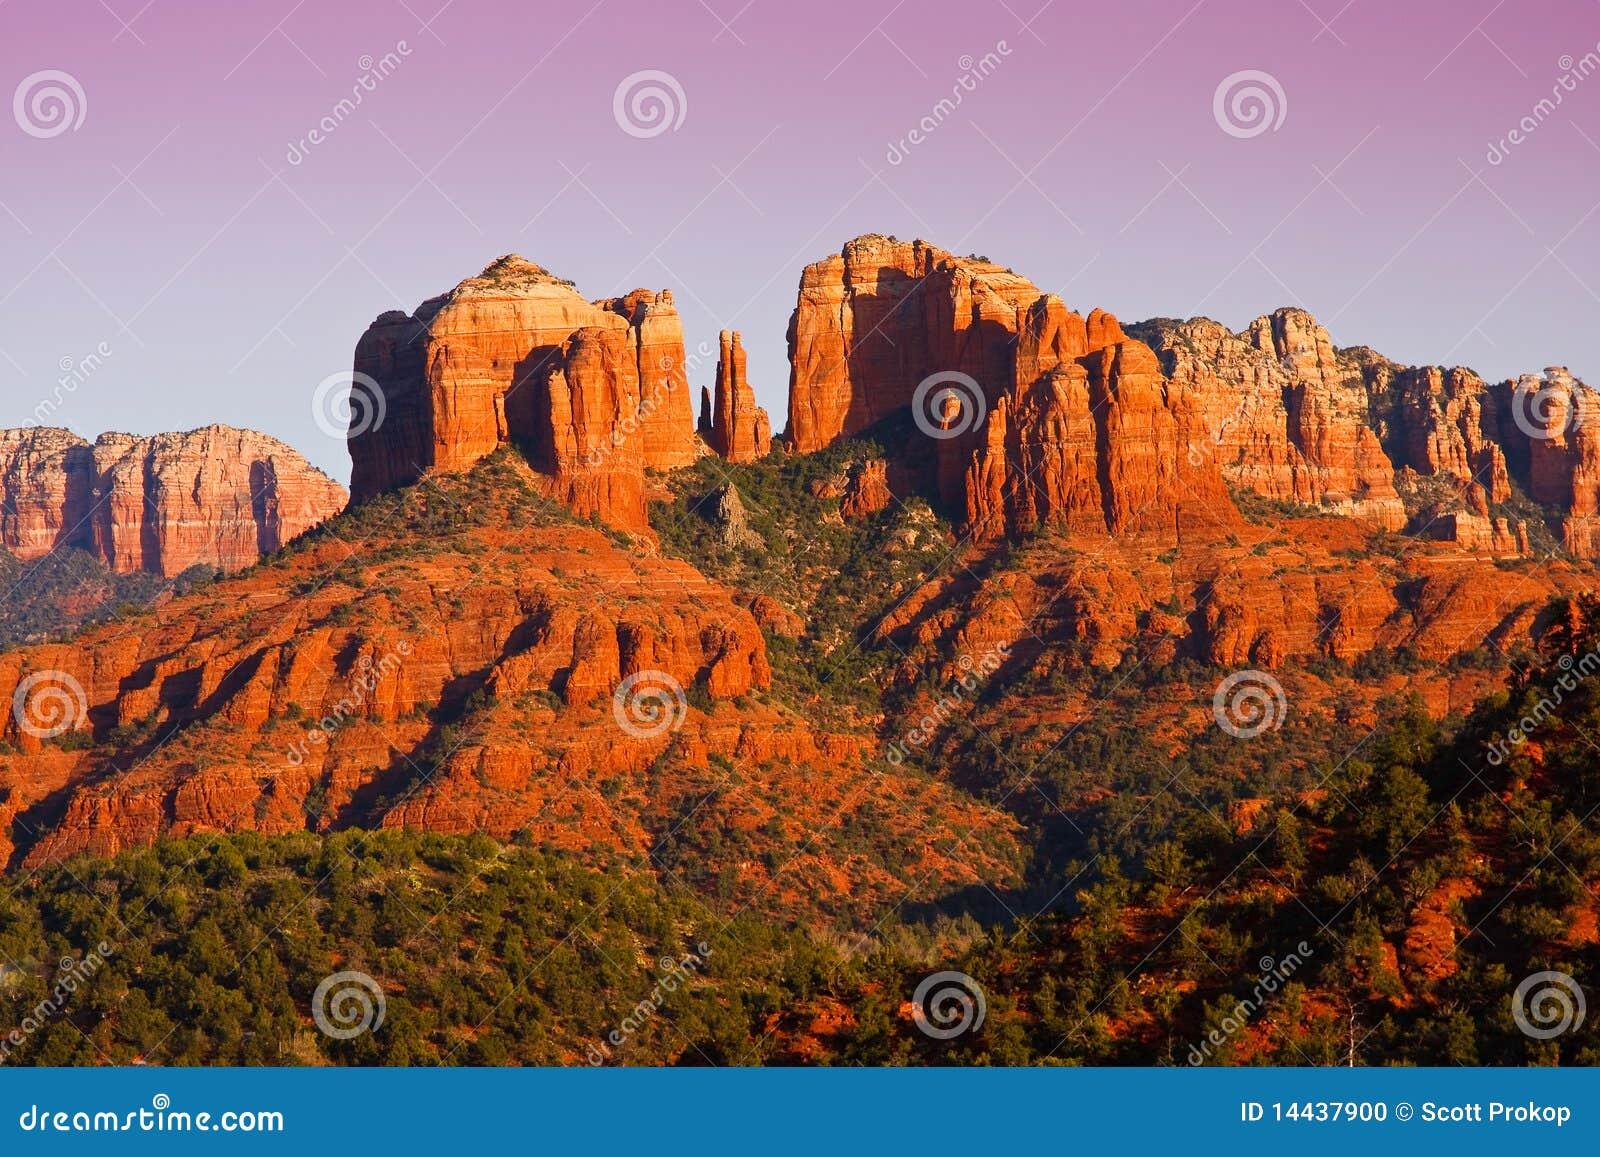 Sunset on Cathedral Rock near Sedona, Arizona.